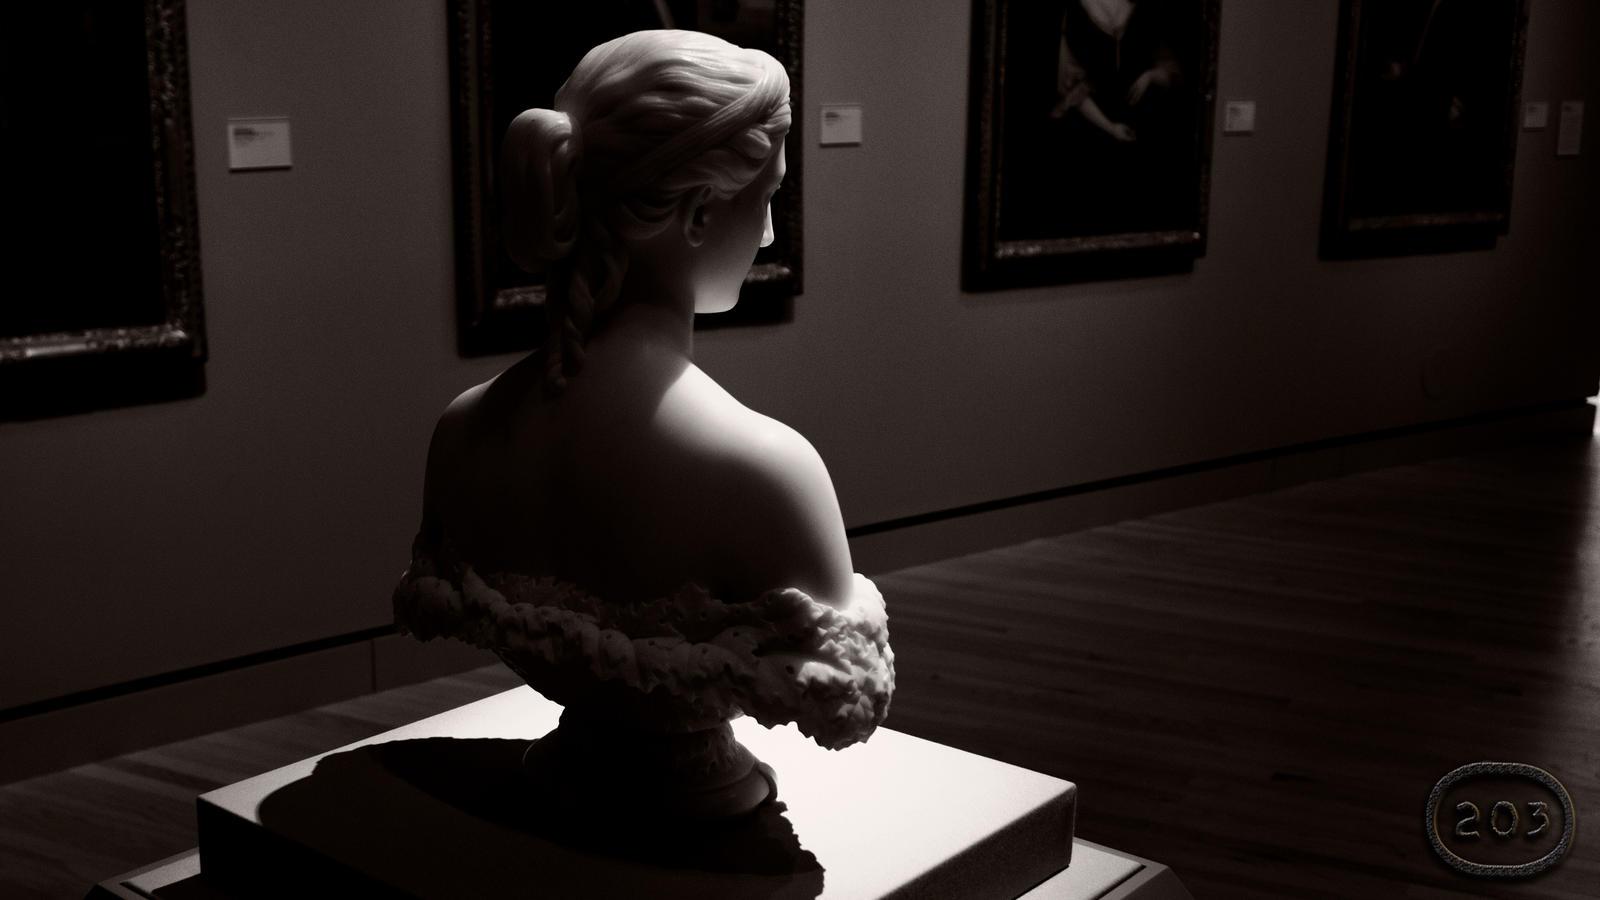 The Goddess Proserpine by GlenRoberson